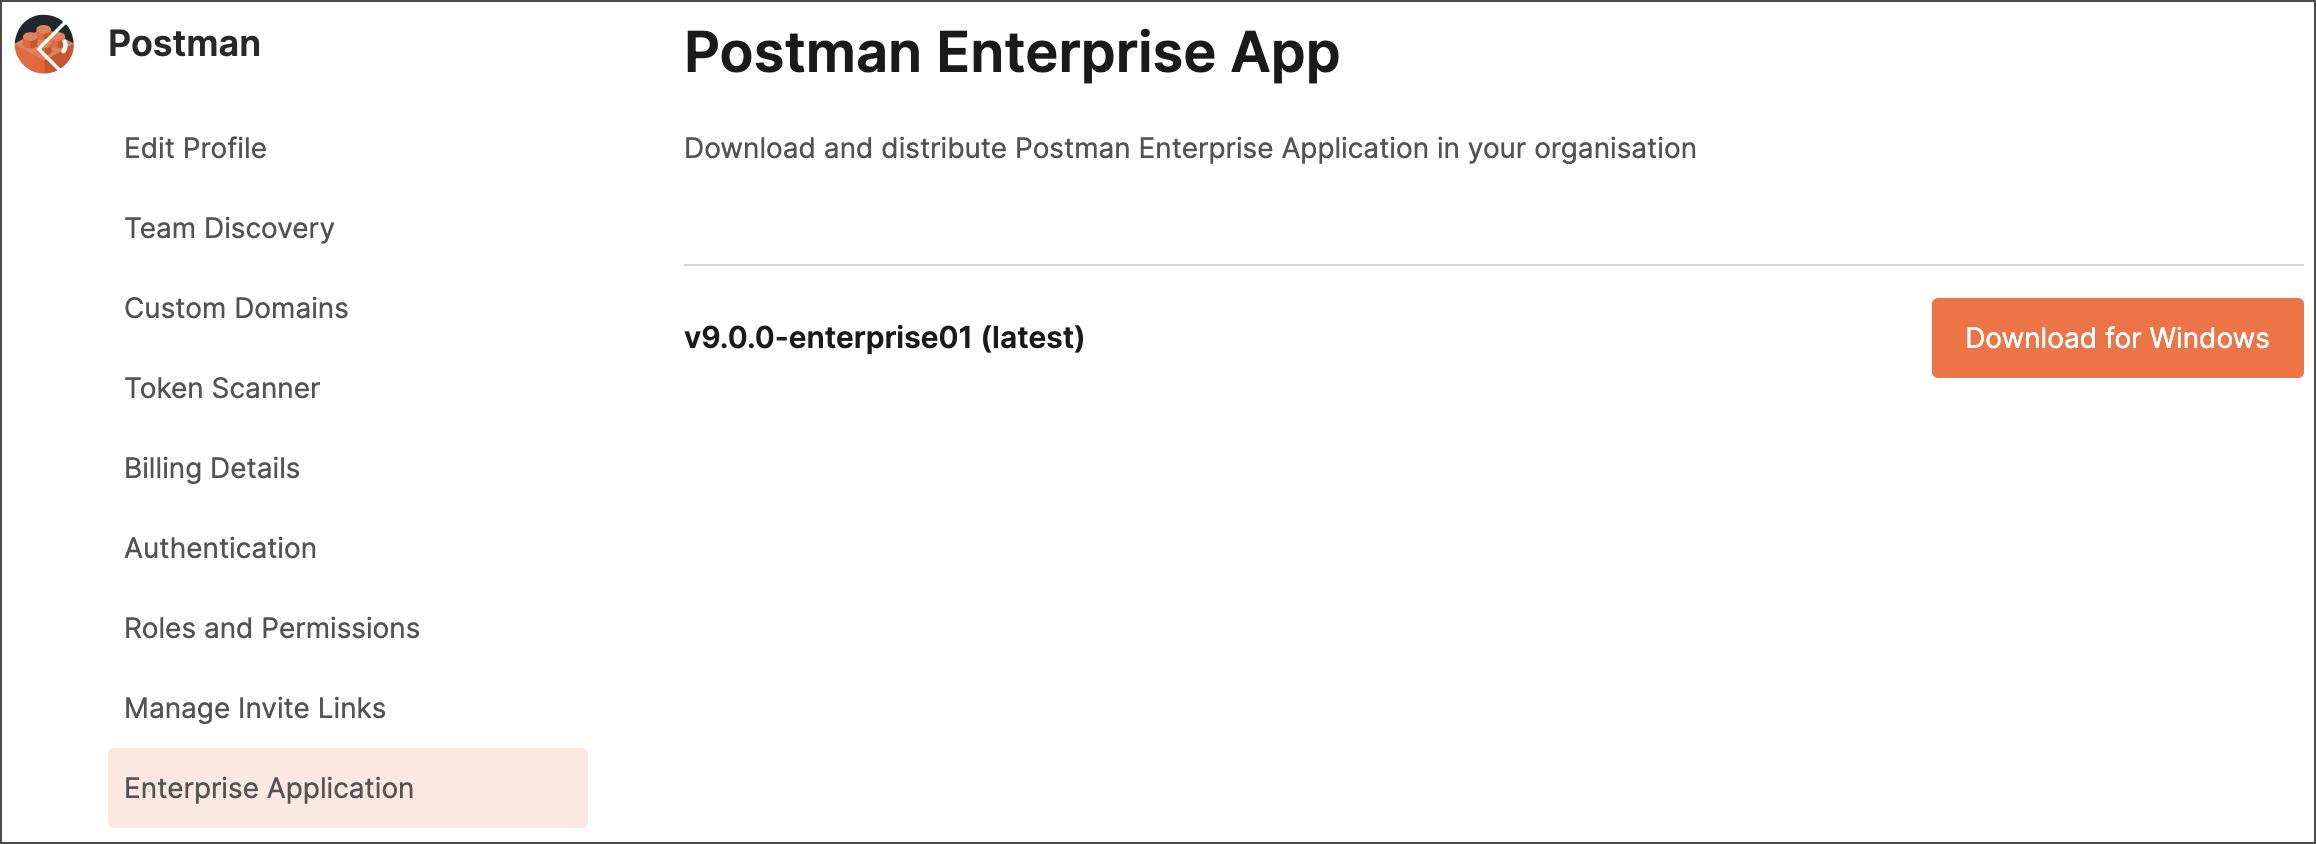 Postman Enterprise app download